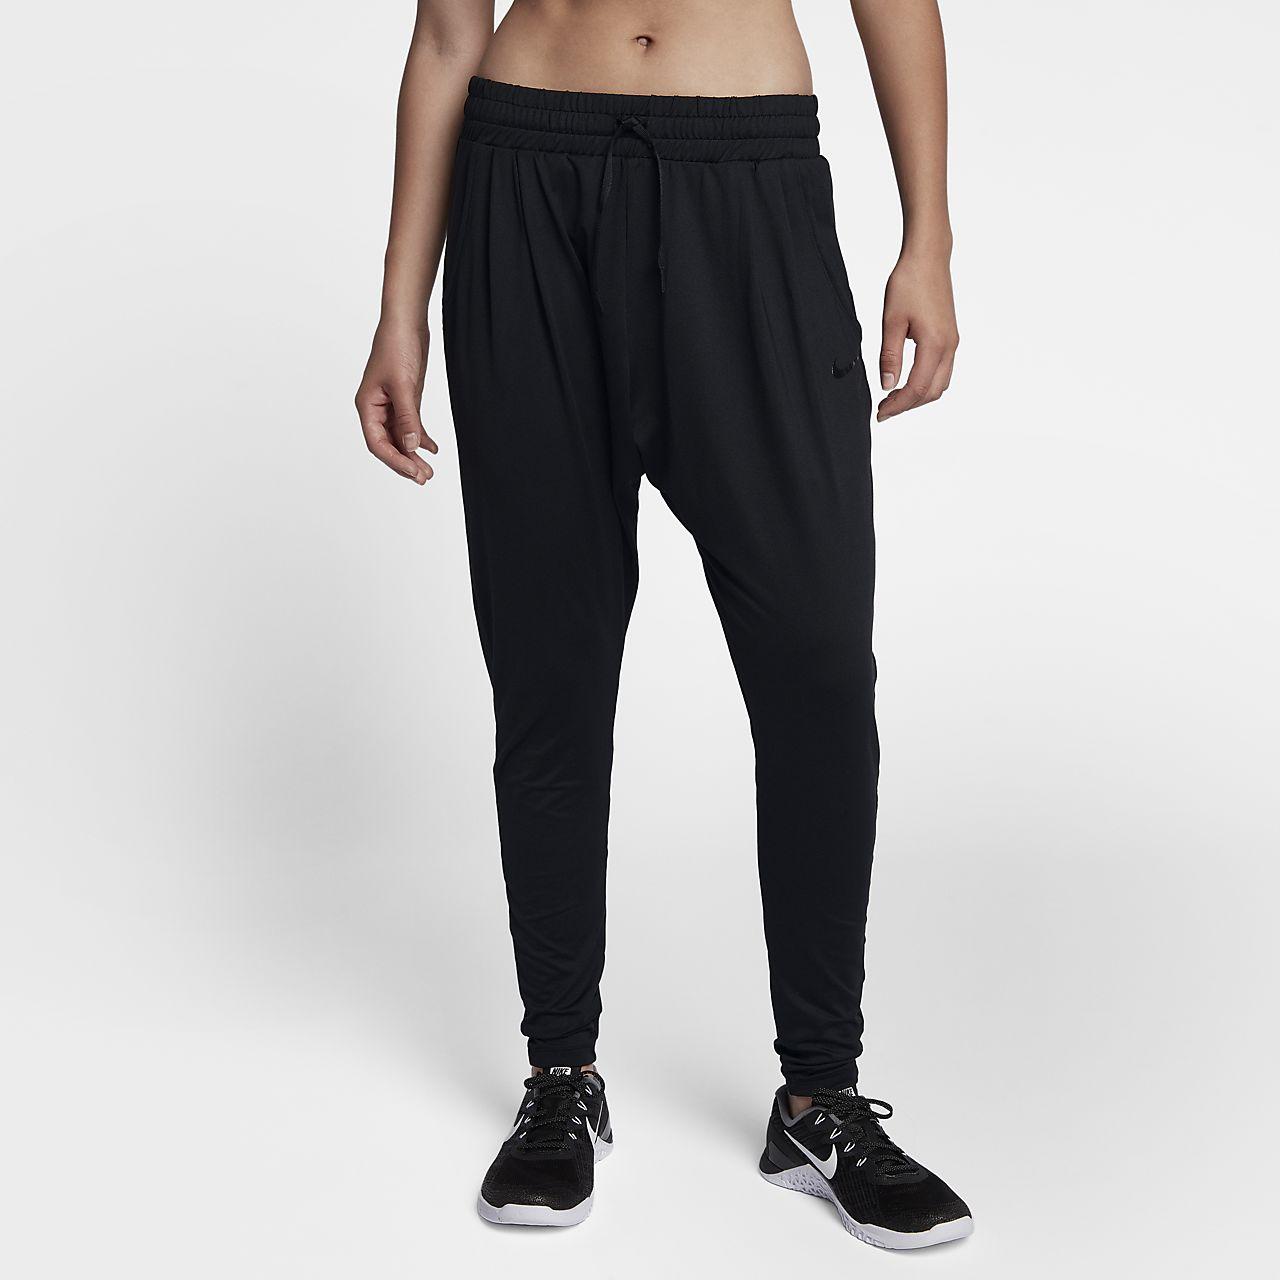 efb36adeee33 Nike Dri-FIT Lux Flow Women s Mid-Rise Training Trousers. Nike.com AU